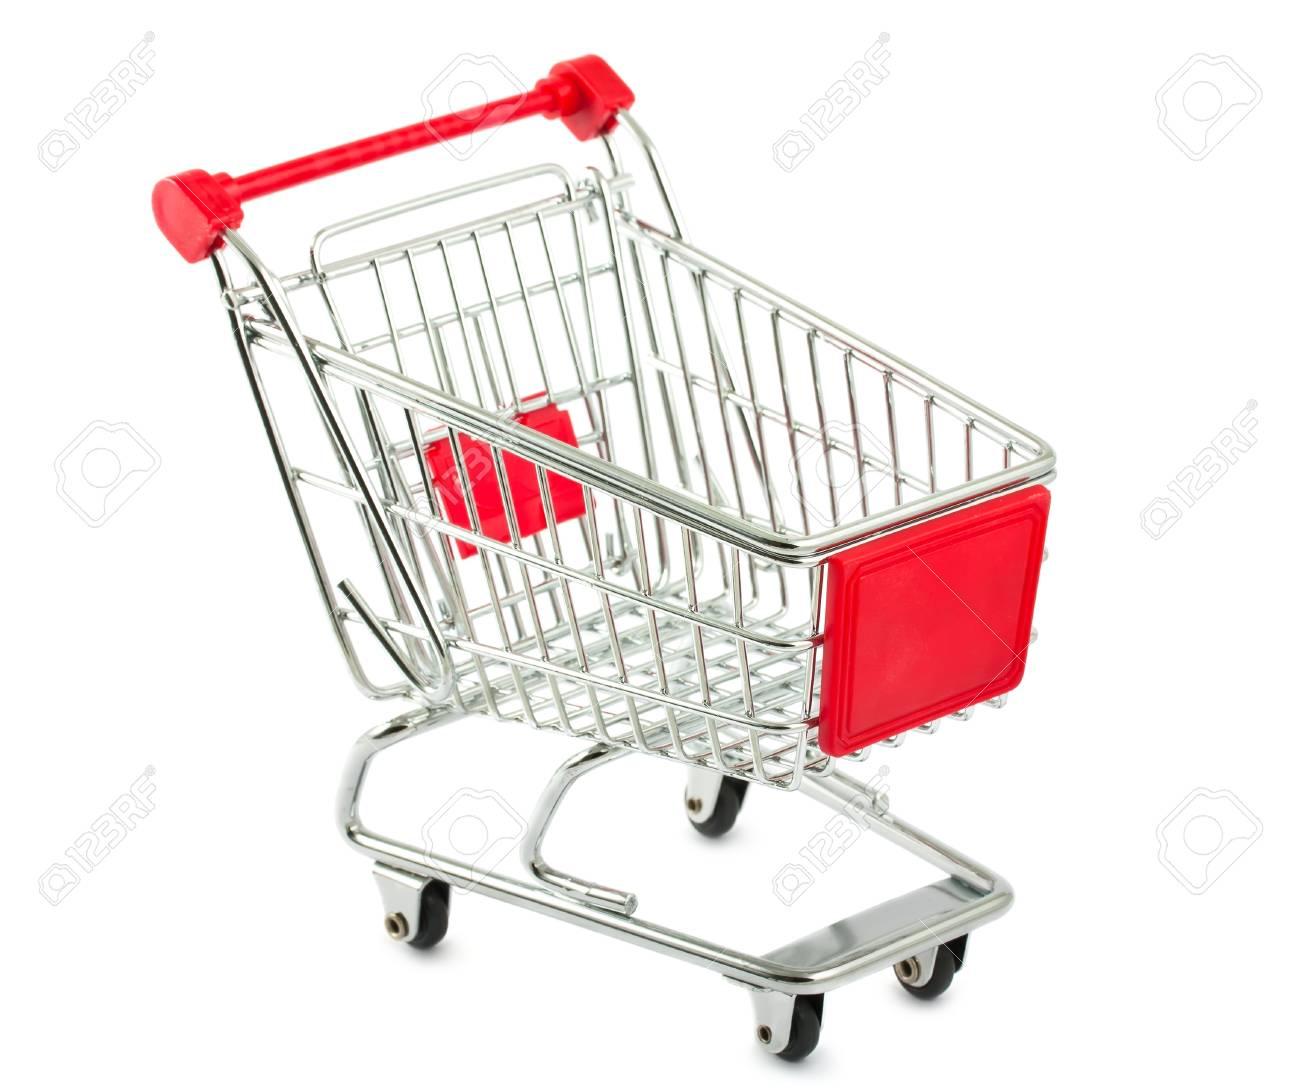 Metal shopping cart isolated on white background Stock Photo - 11270726